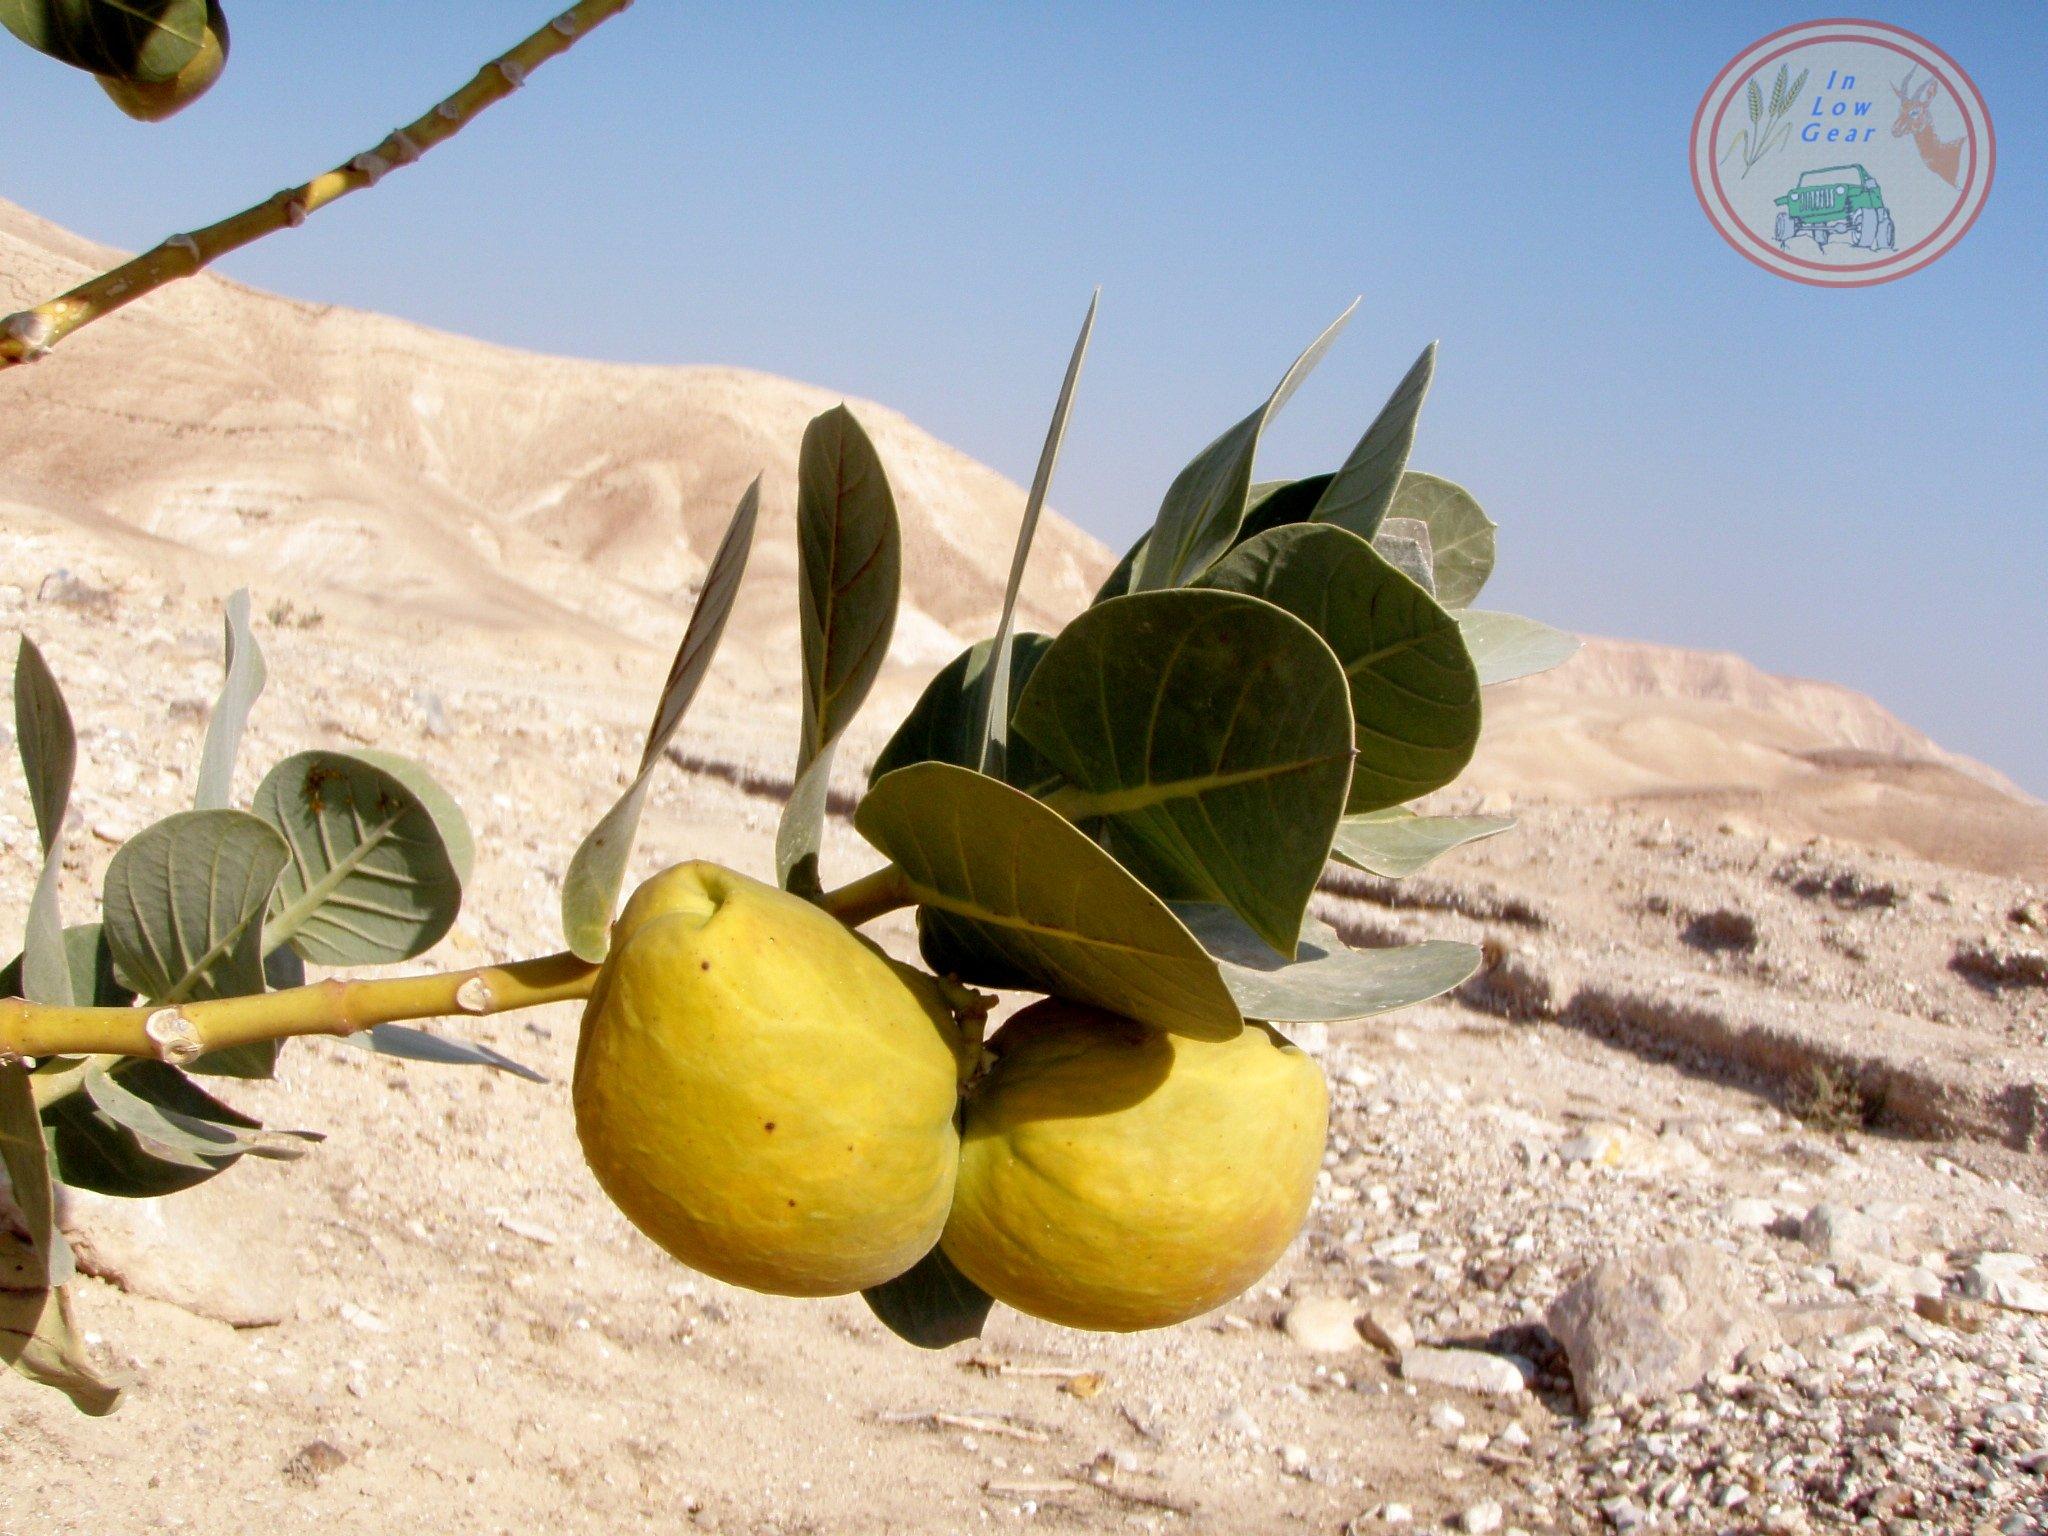 Tapuah Sdom Nahal Kidron תפוח סדום בנחל קדרון